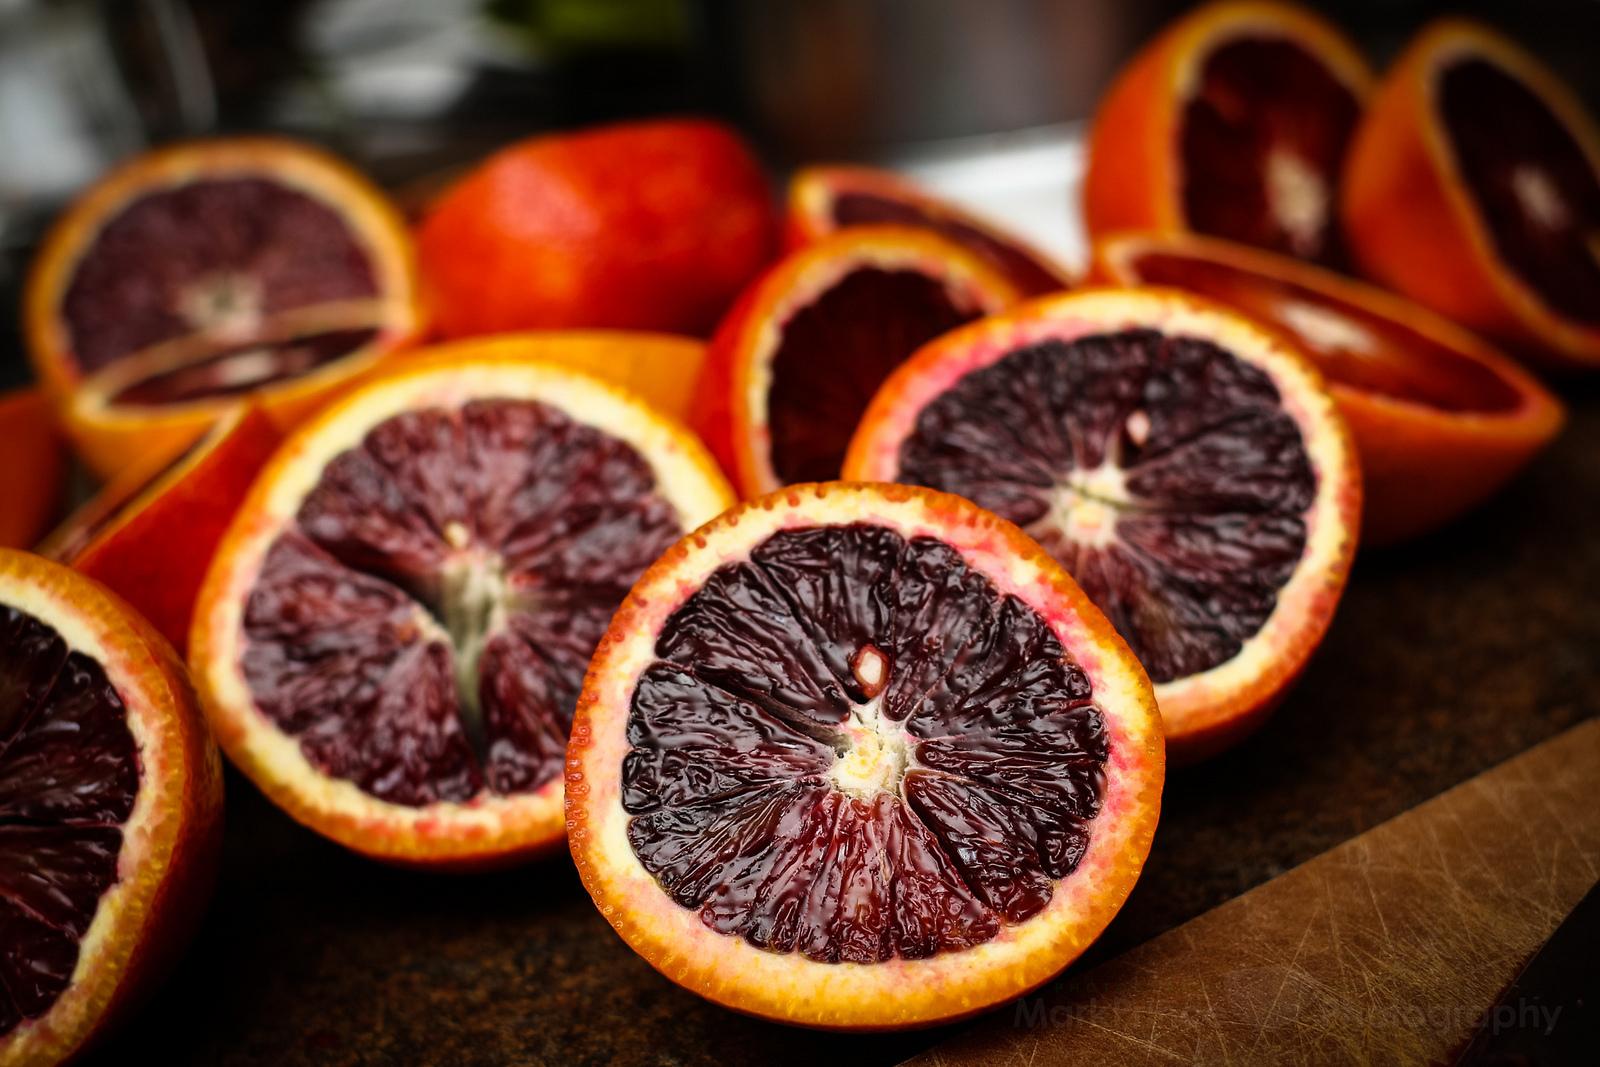 Oranges sanguines (c) Mark CC BY-NC-ND 2.0